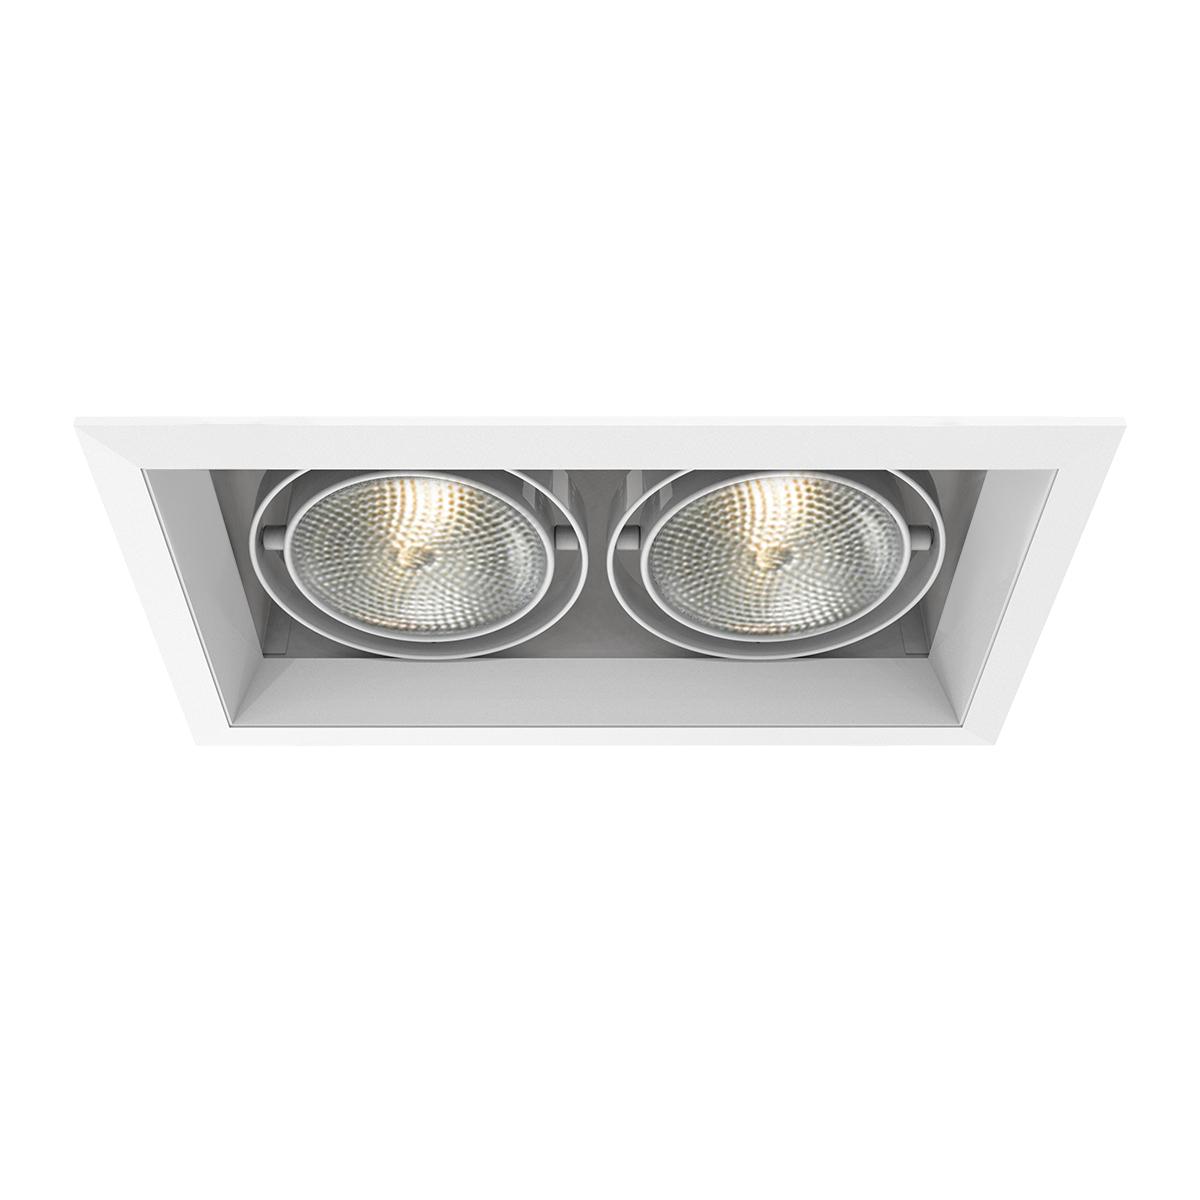 Eurofase TE132 2-Light PAR30 Multiple Recessed Light Fixture White